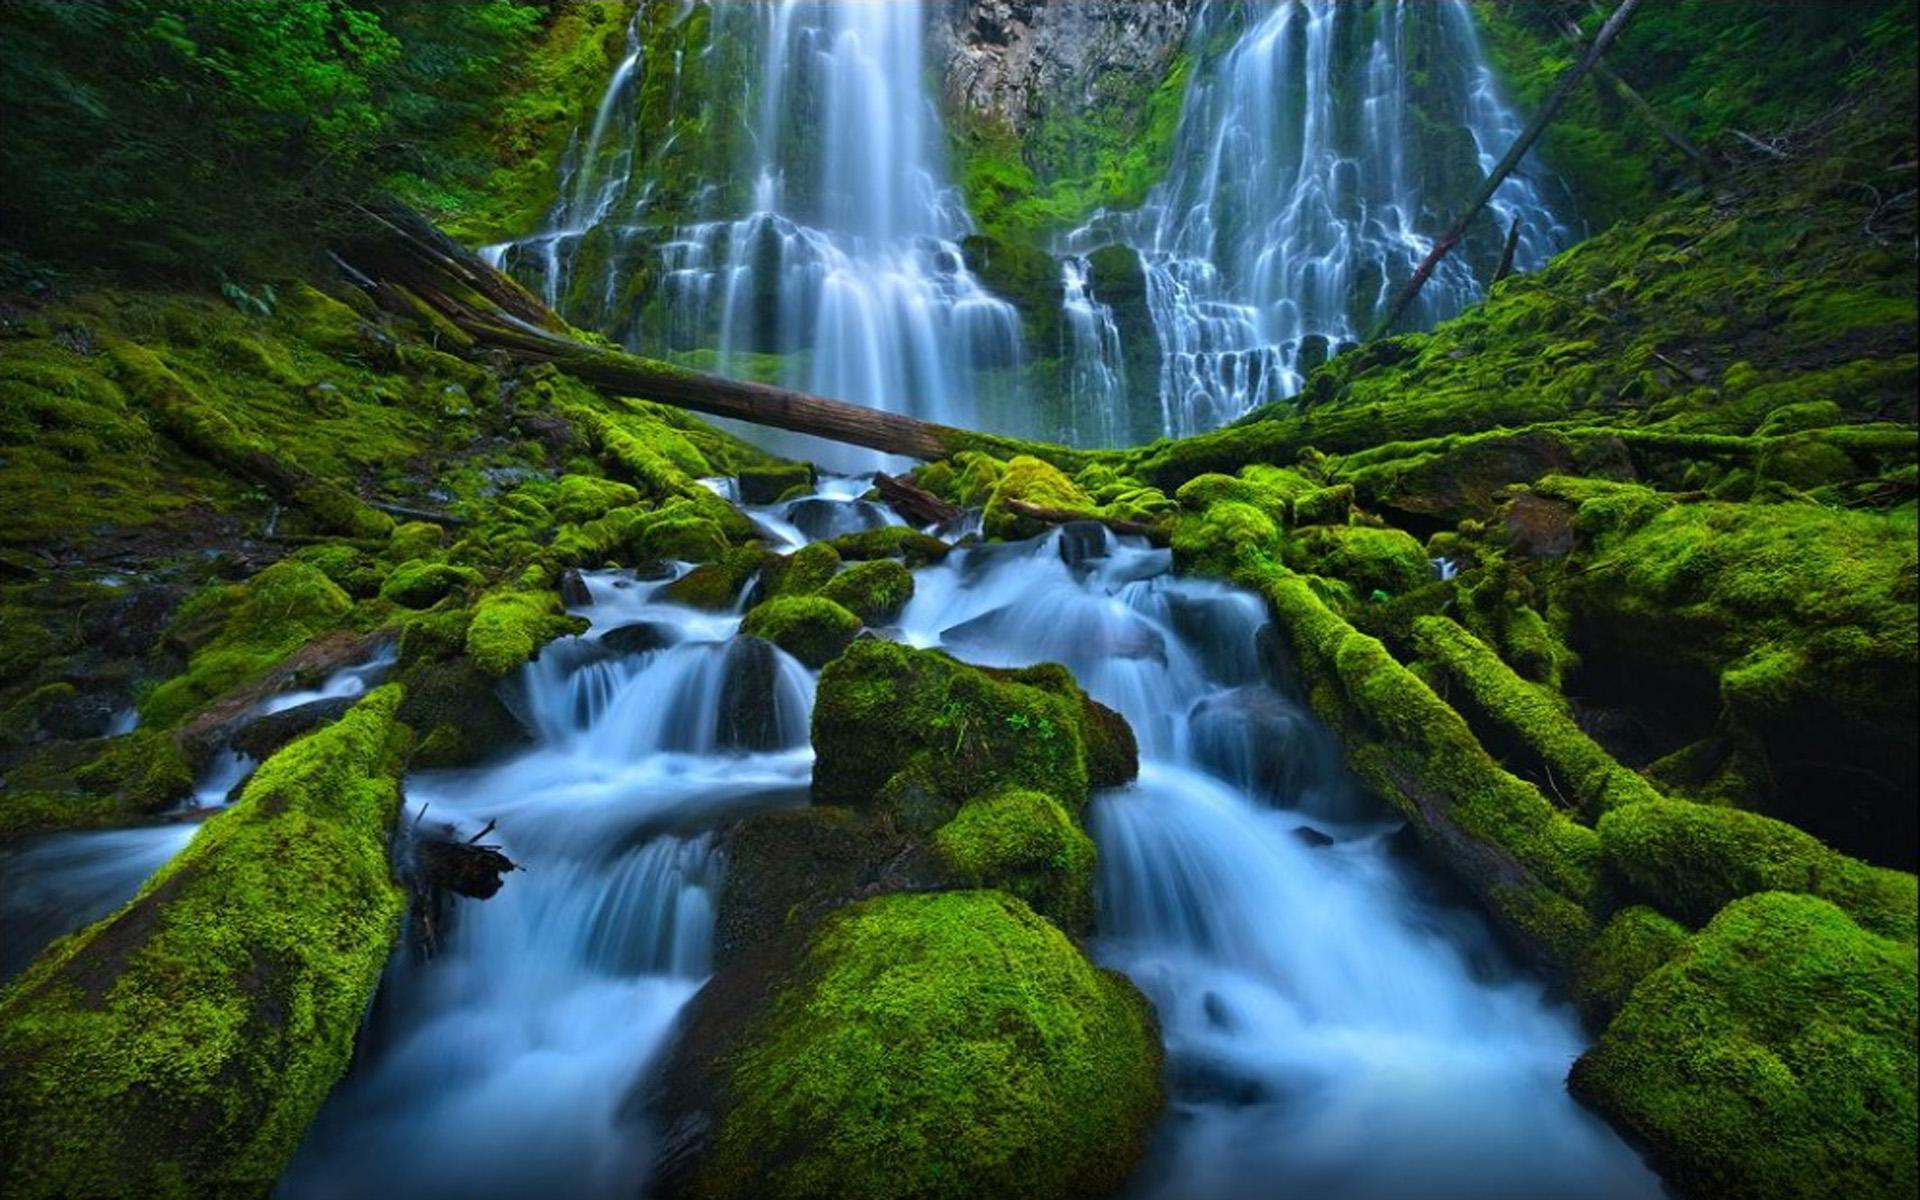 Waterfalls desktop wallpaper forest falls waterfall river - Waterfalls desktop wallpaper forest falls ...